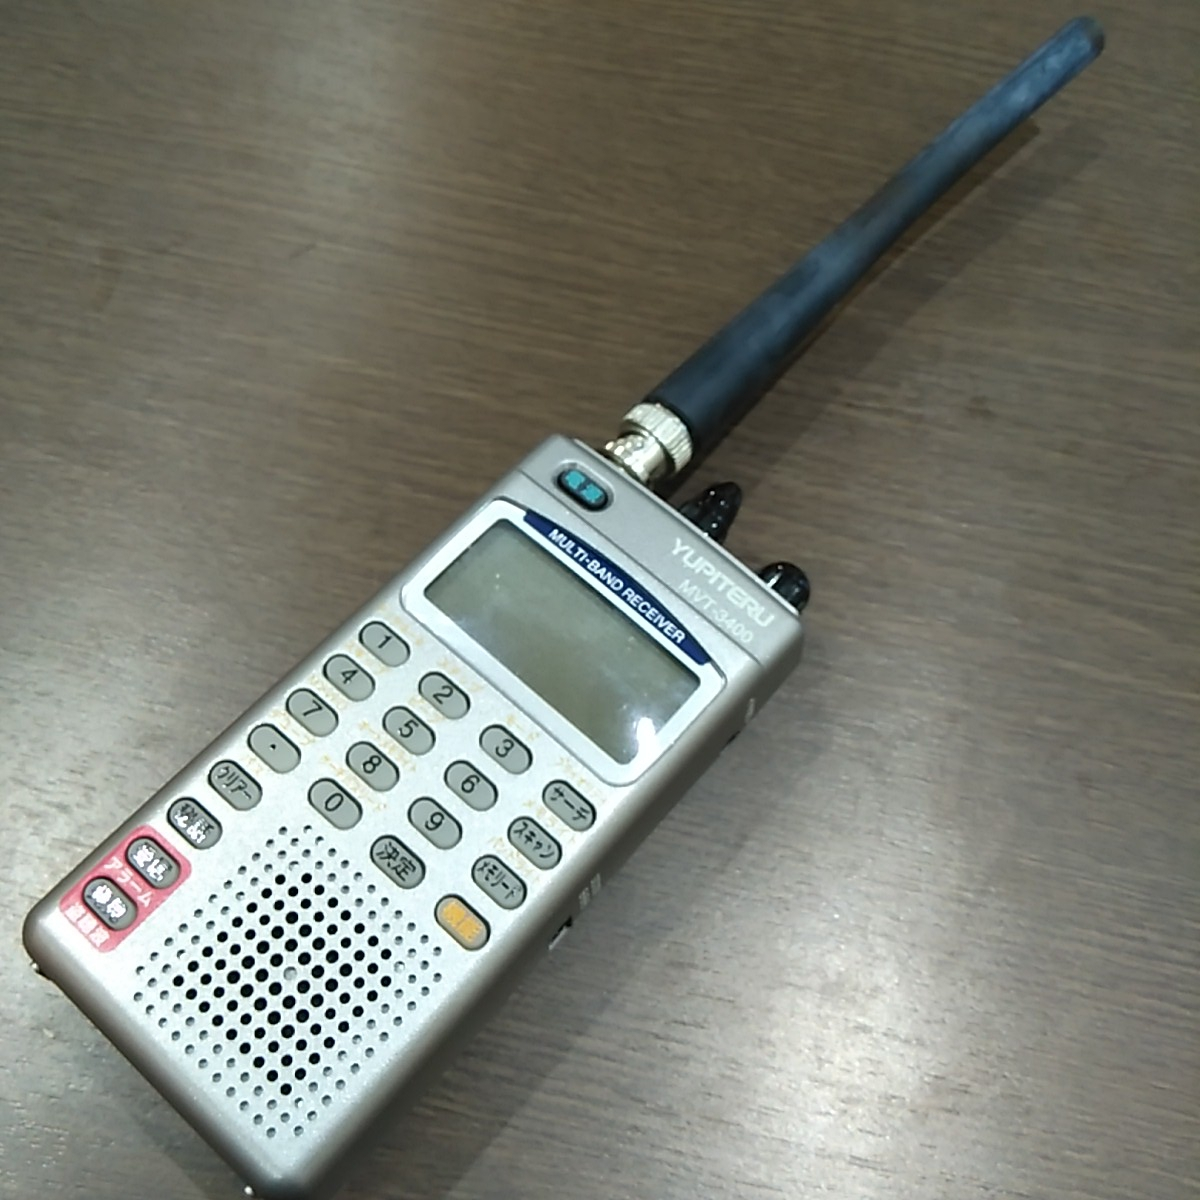 YUPITERU ユピテル マルチバンドレシーバー MVT-3400 盗聴器発見機能付き